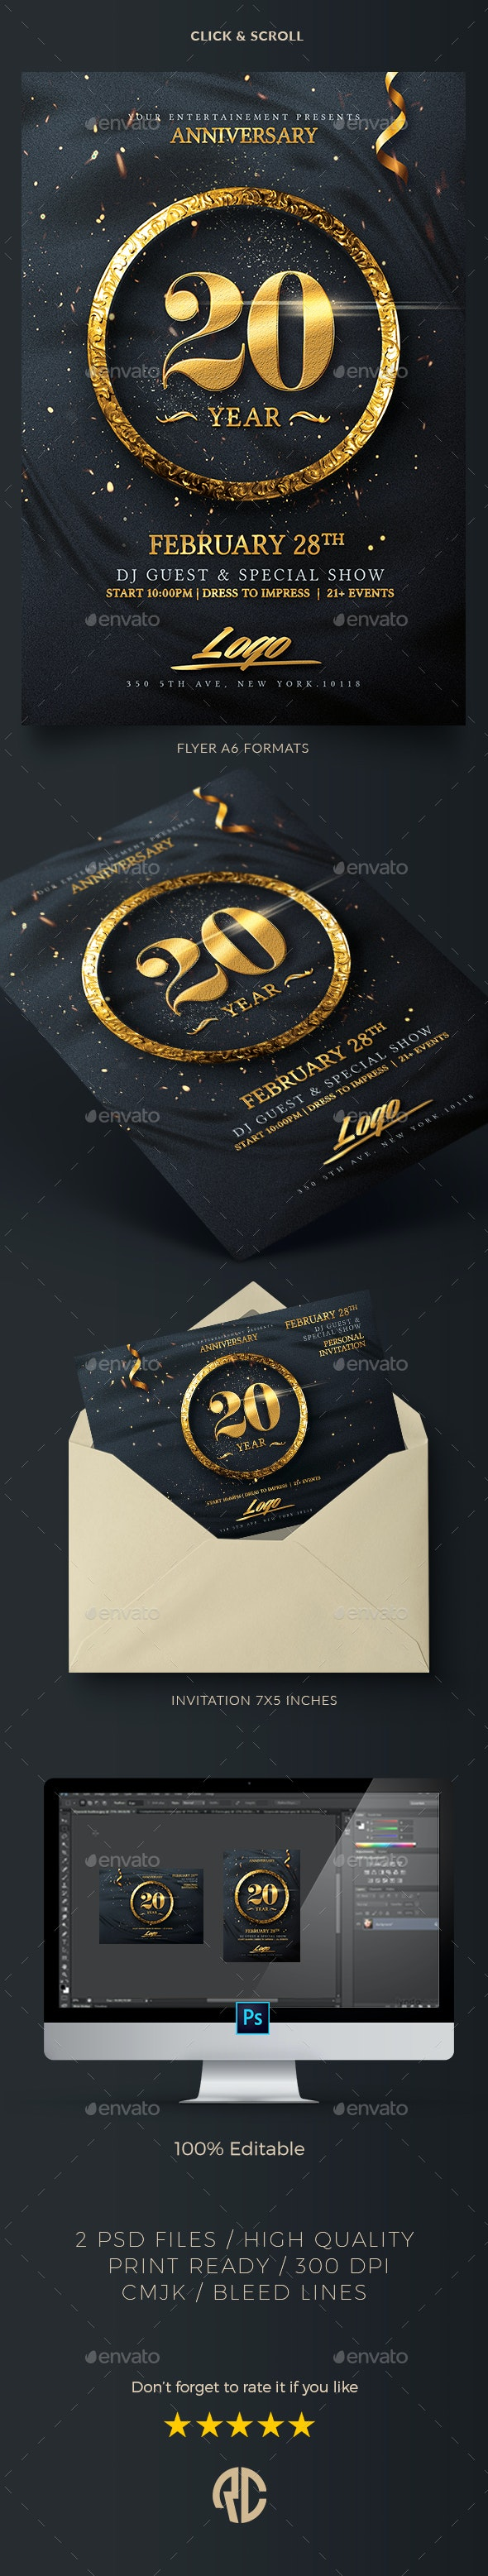 Classy Birthday Invitation - Events Flyers